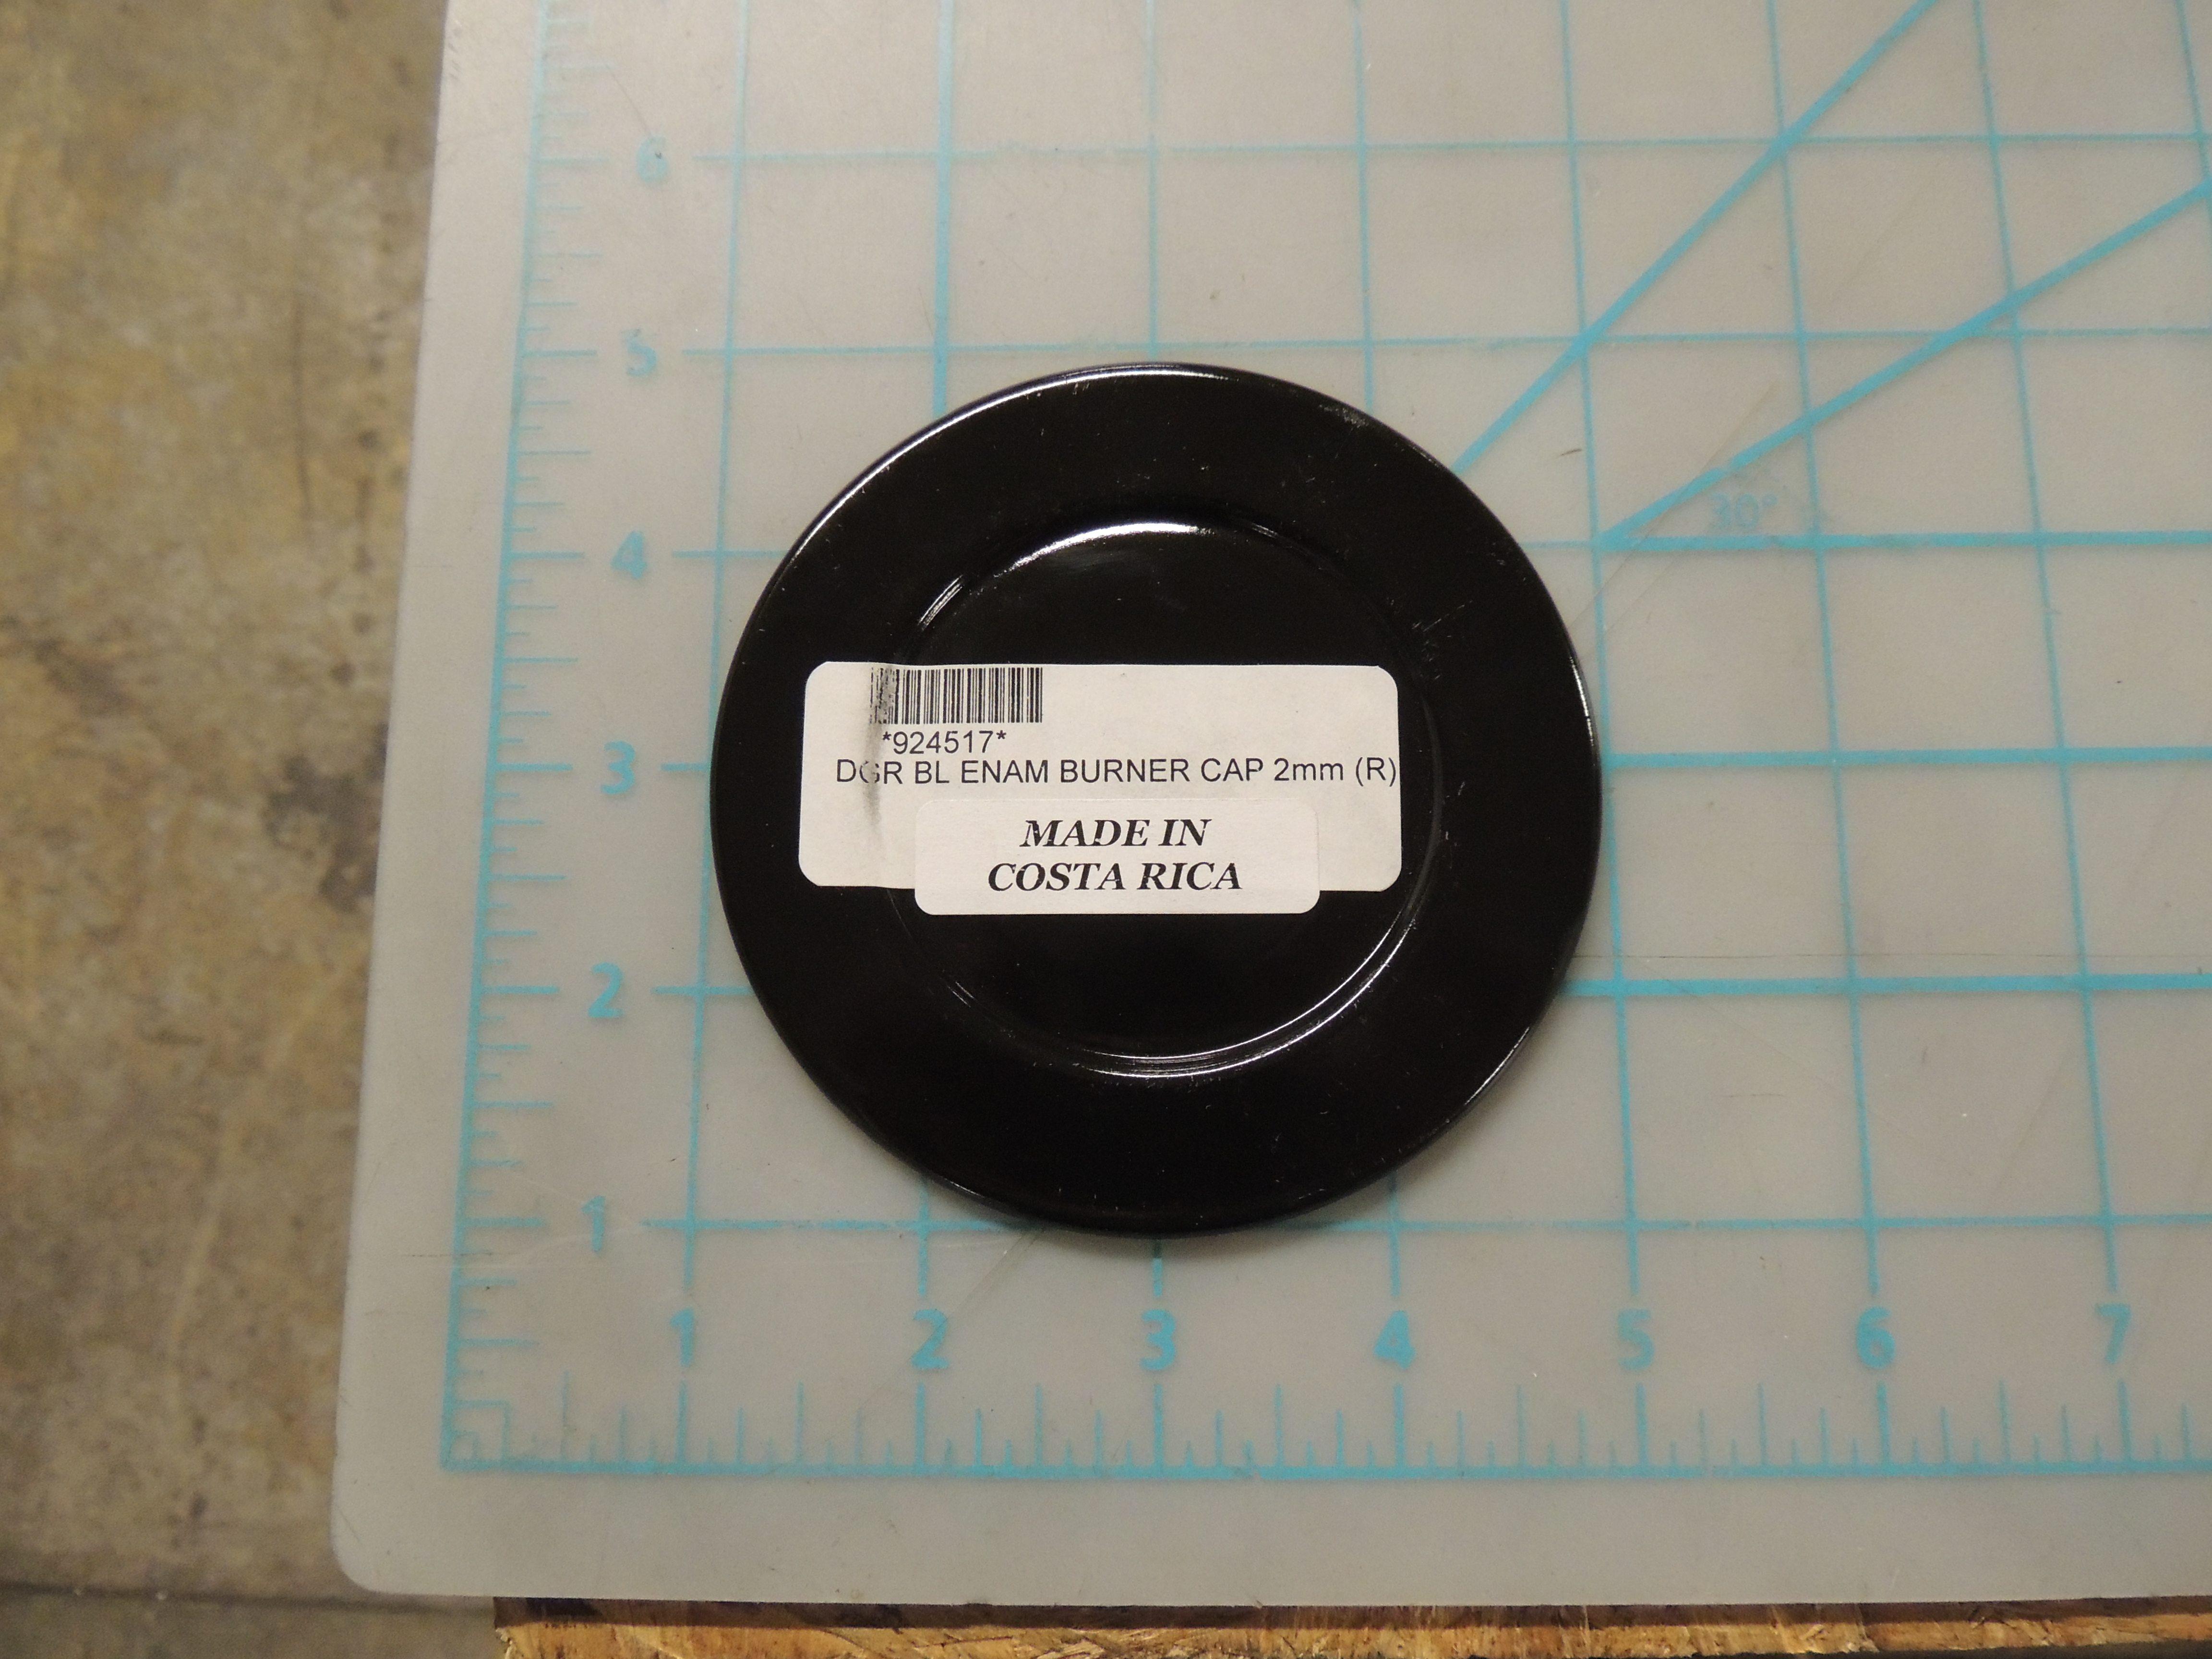 DGR BL ENAM BURNER CAP 2mm (R)